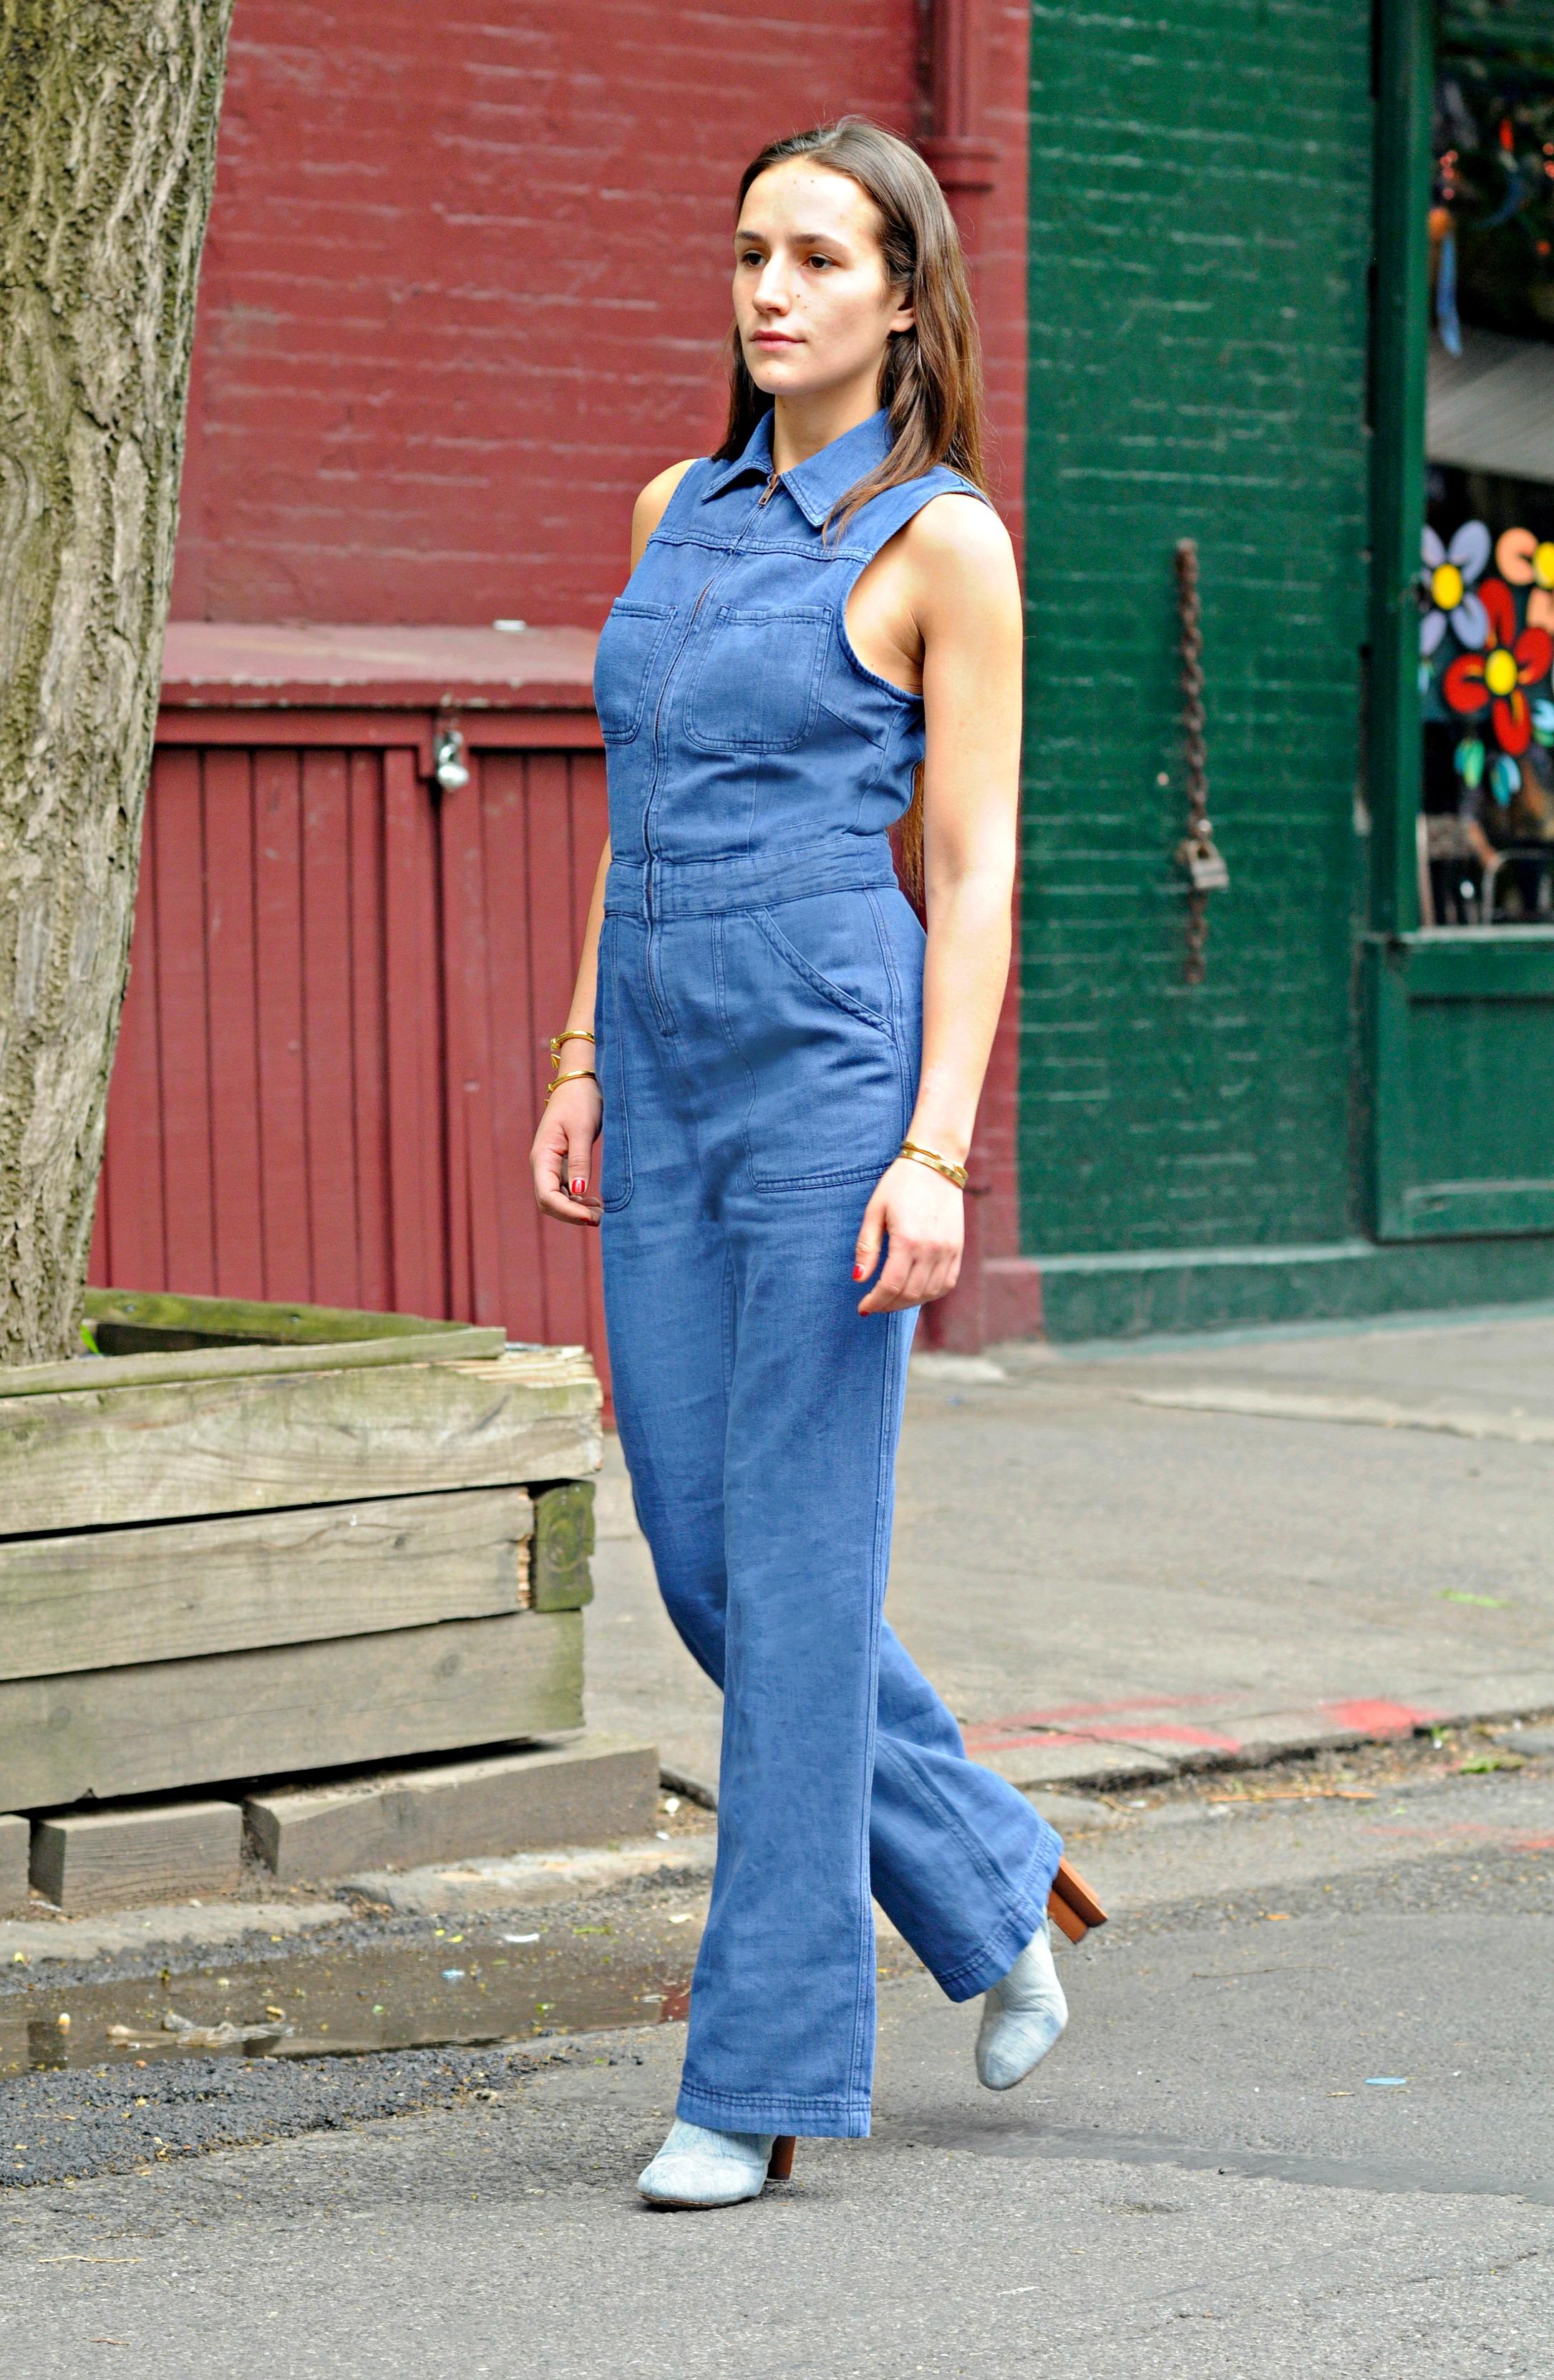 NYC FASHION BLOGGER SOPHIE BICKLEY FREE PEOPLE DENIM JUMPSUIT